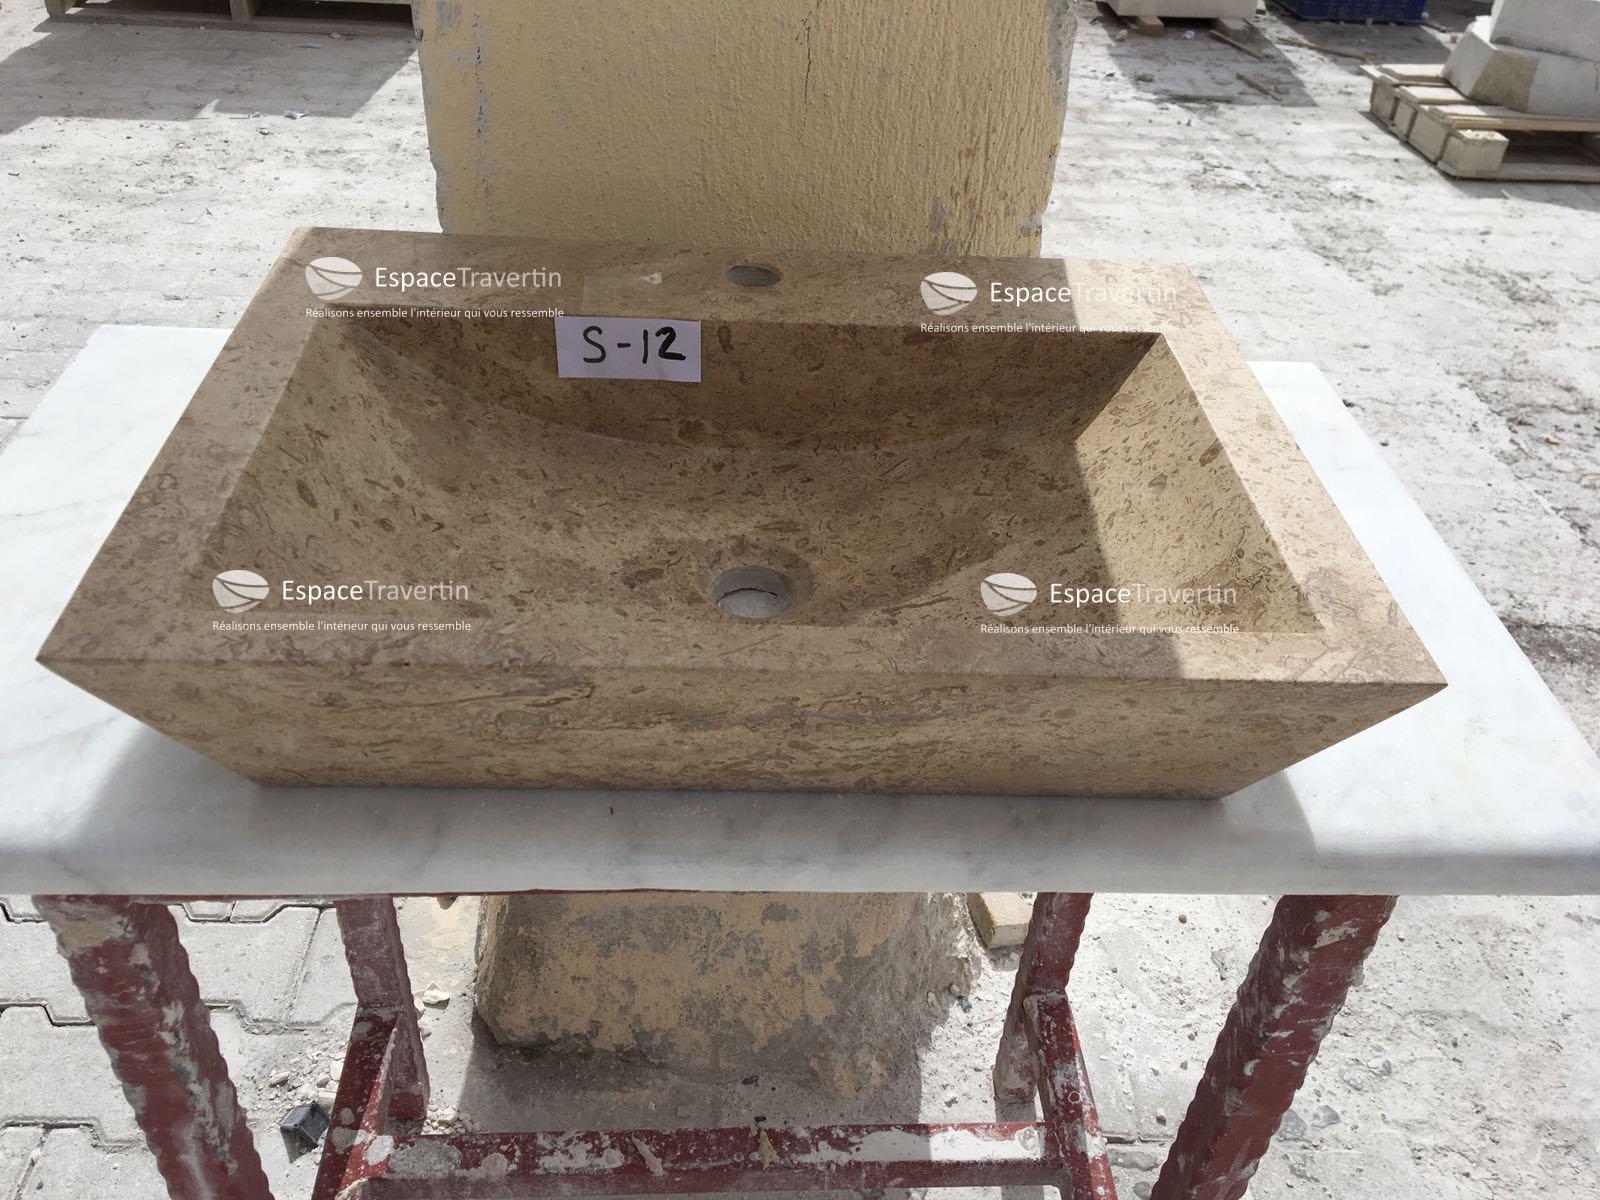 vasque travertin noce espace travertin. Black Bedroom Furniture Sets. Home Design Ideas